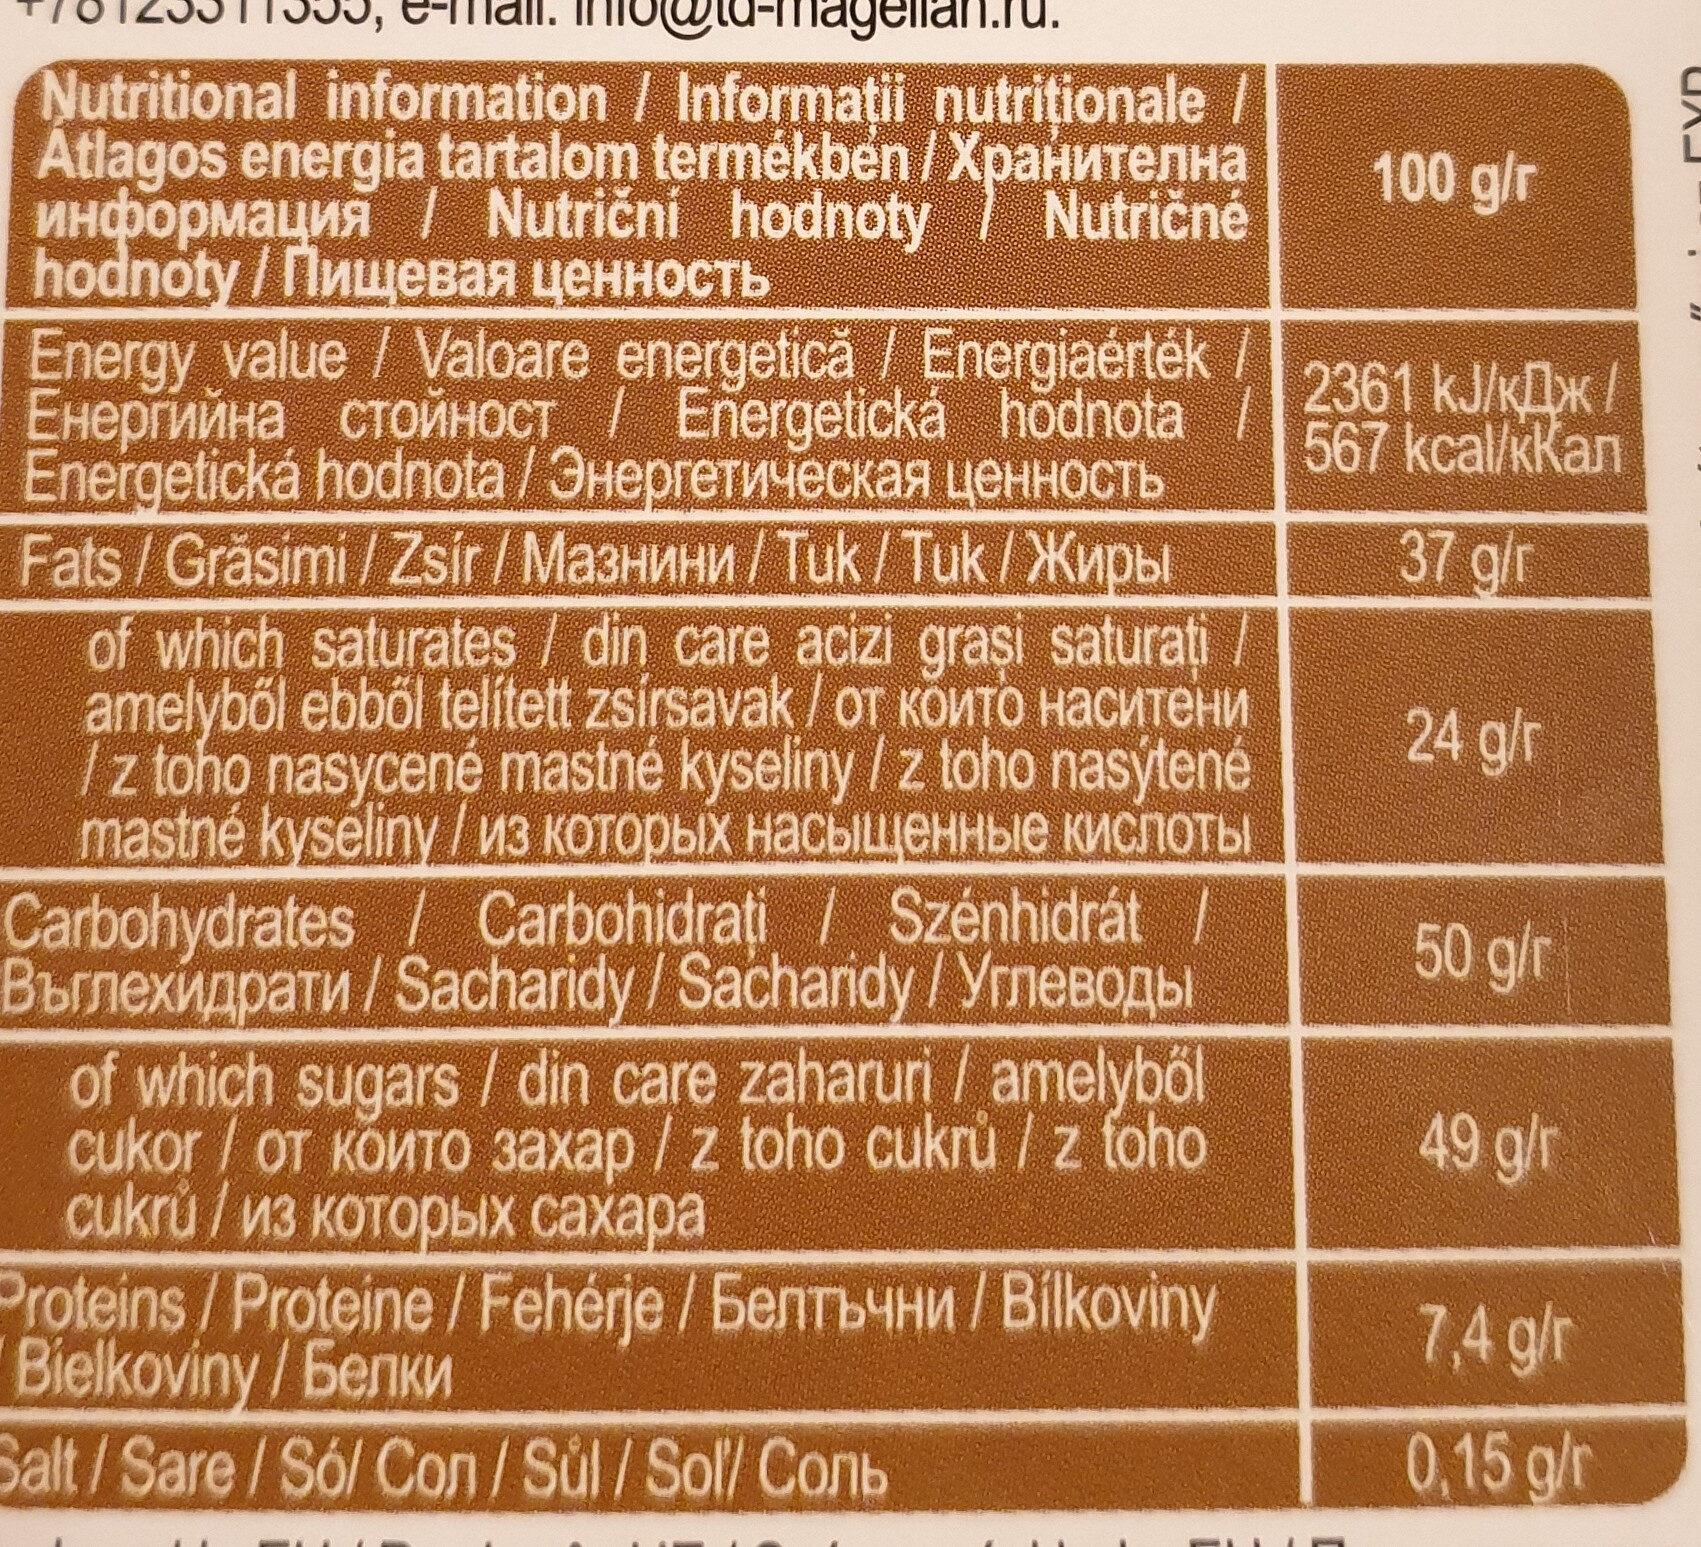 Grand'or Walnuts - Nutrition facts - en